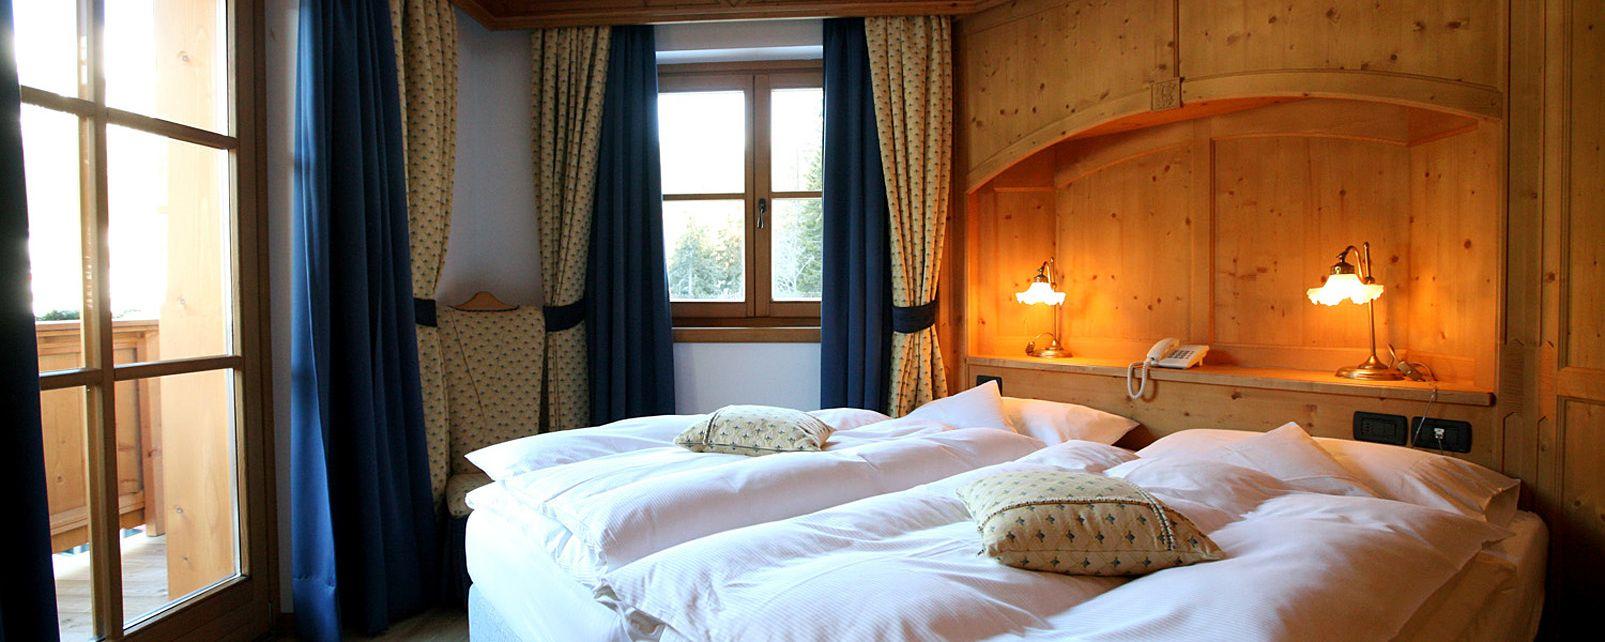 Hôtel Garnì Del Sogno